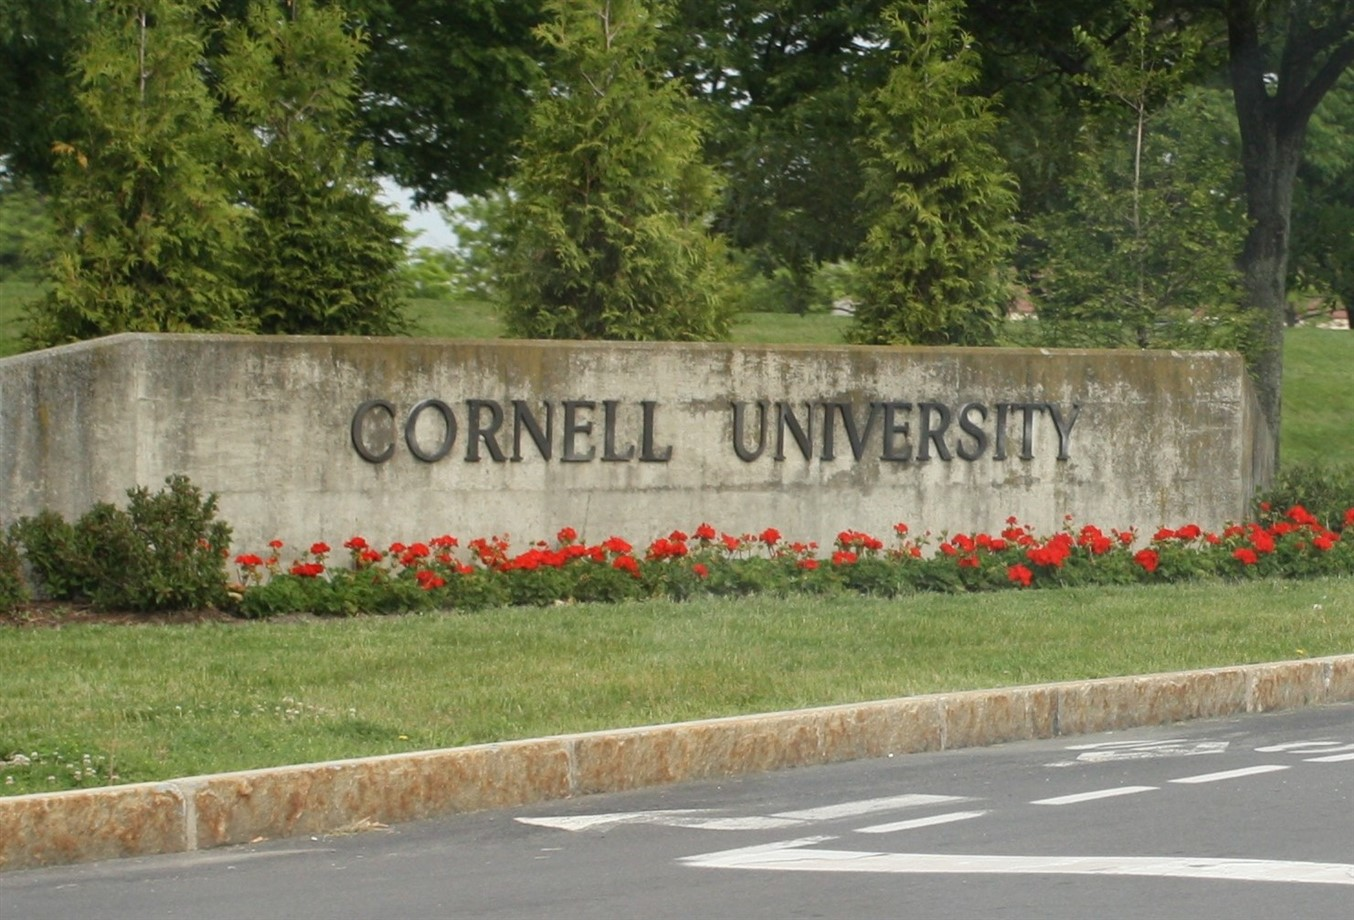 2009 06 17 Law School Road Trip Day 2 5 Cornell Visit.jpg